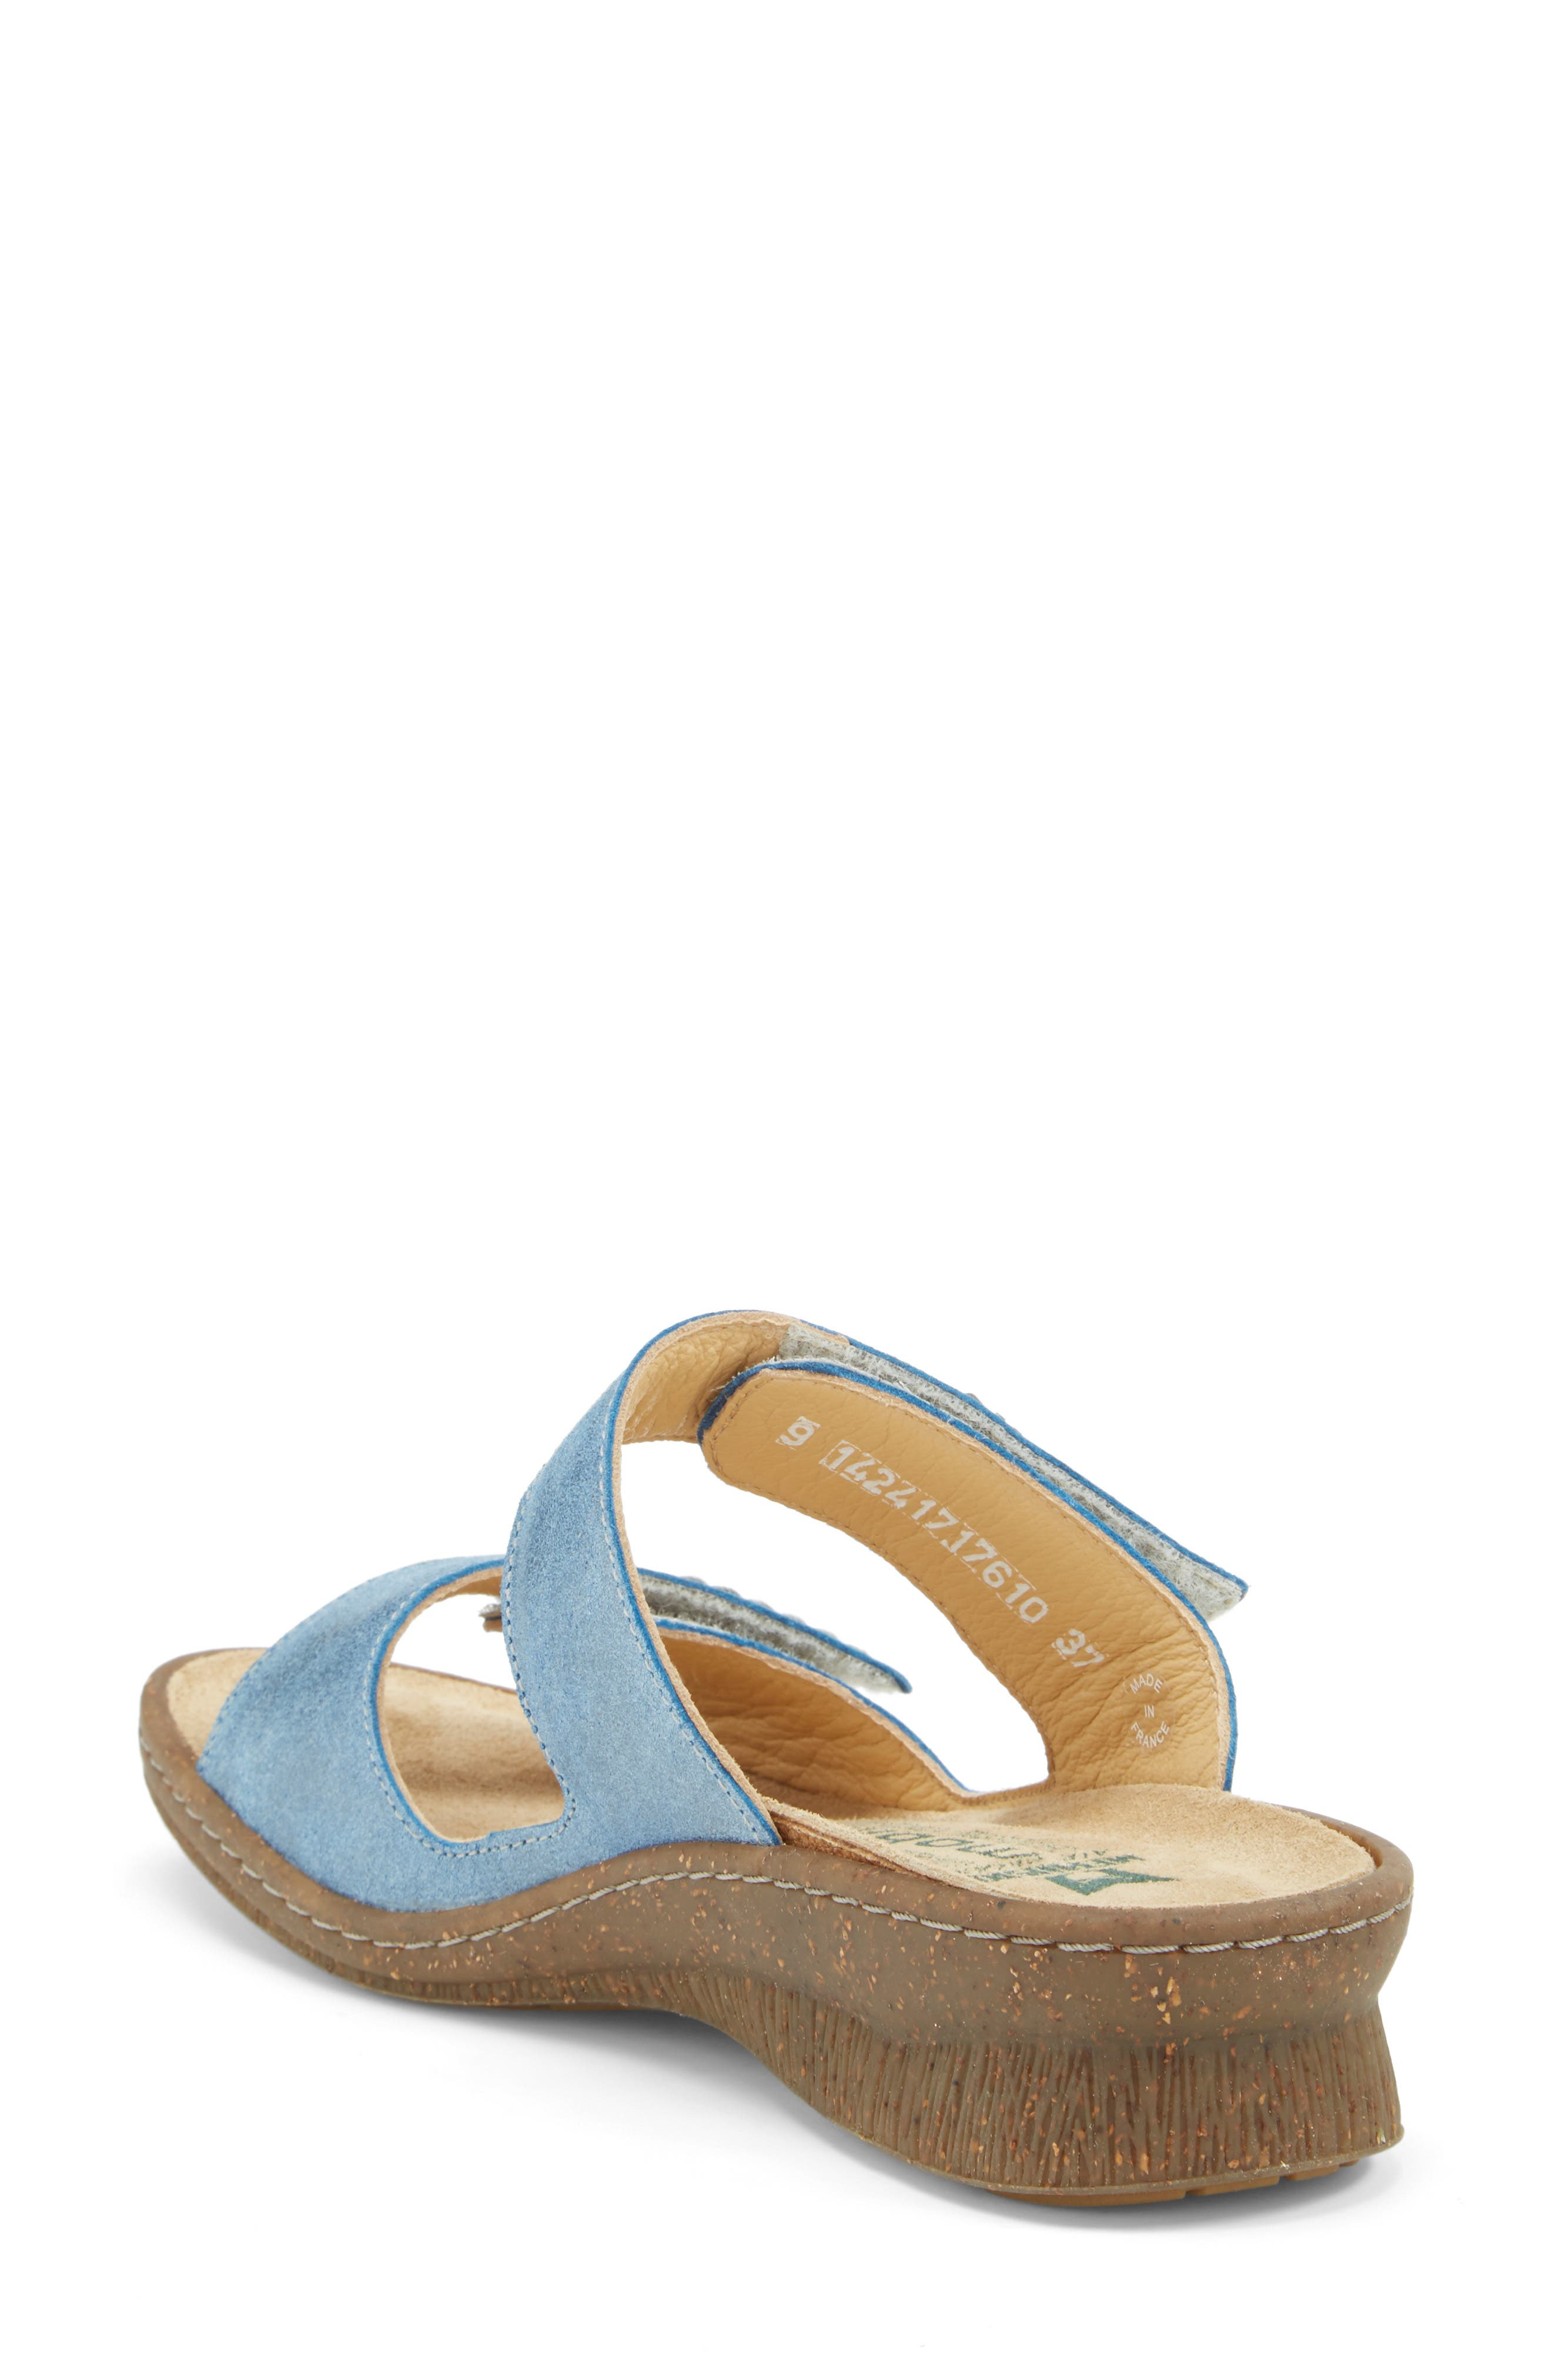 'Bregalia' Metallic Leather Sandal,                             Alternate thumbnail 5, color,                             400